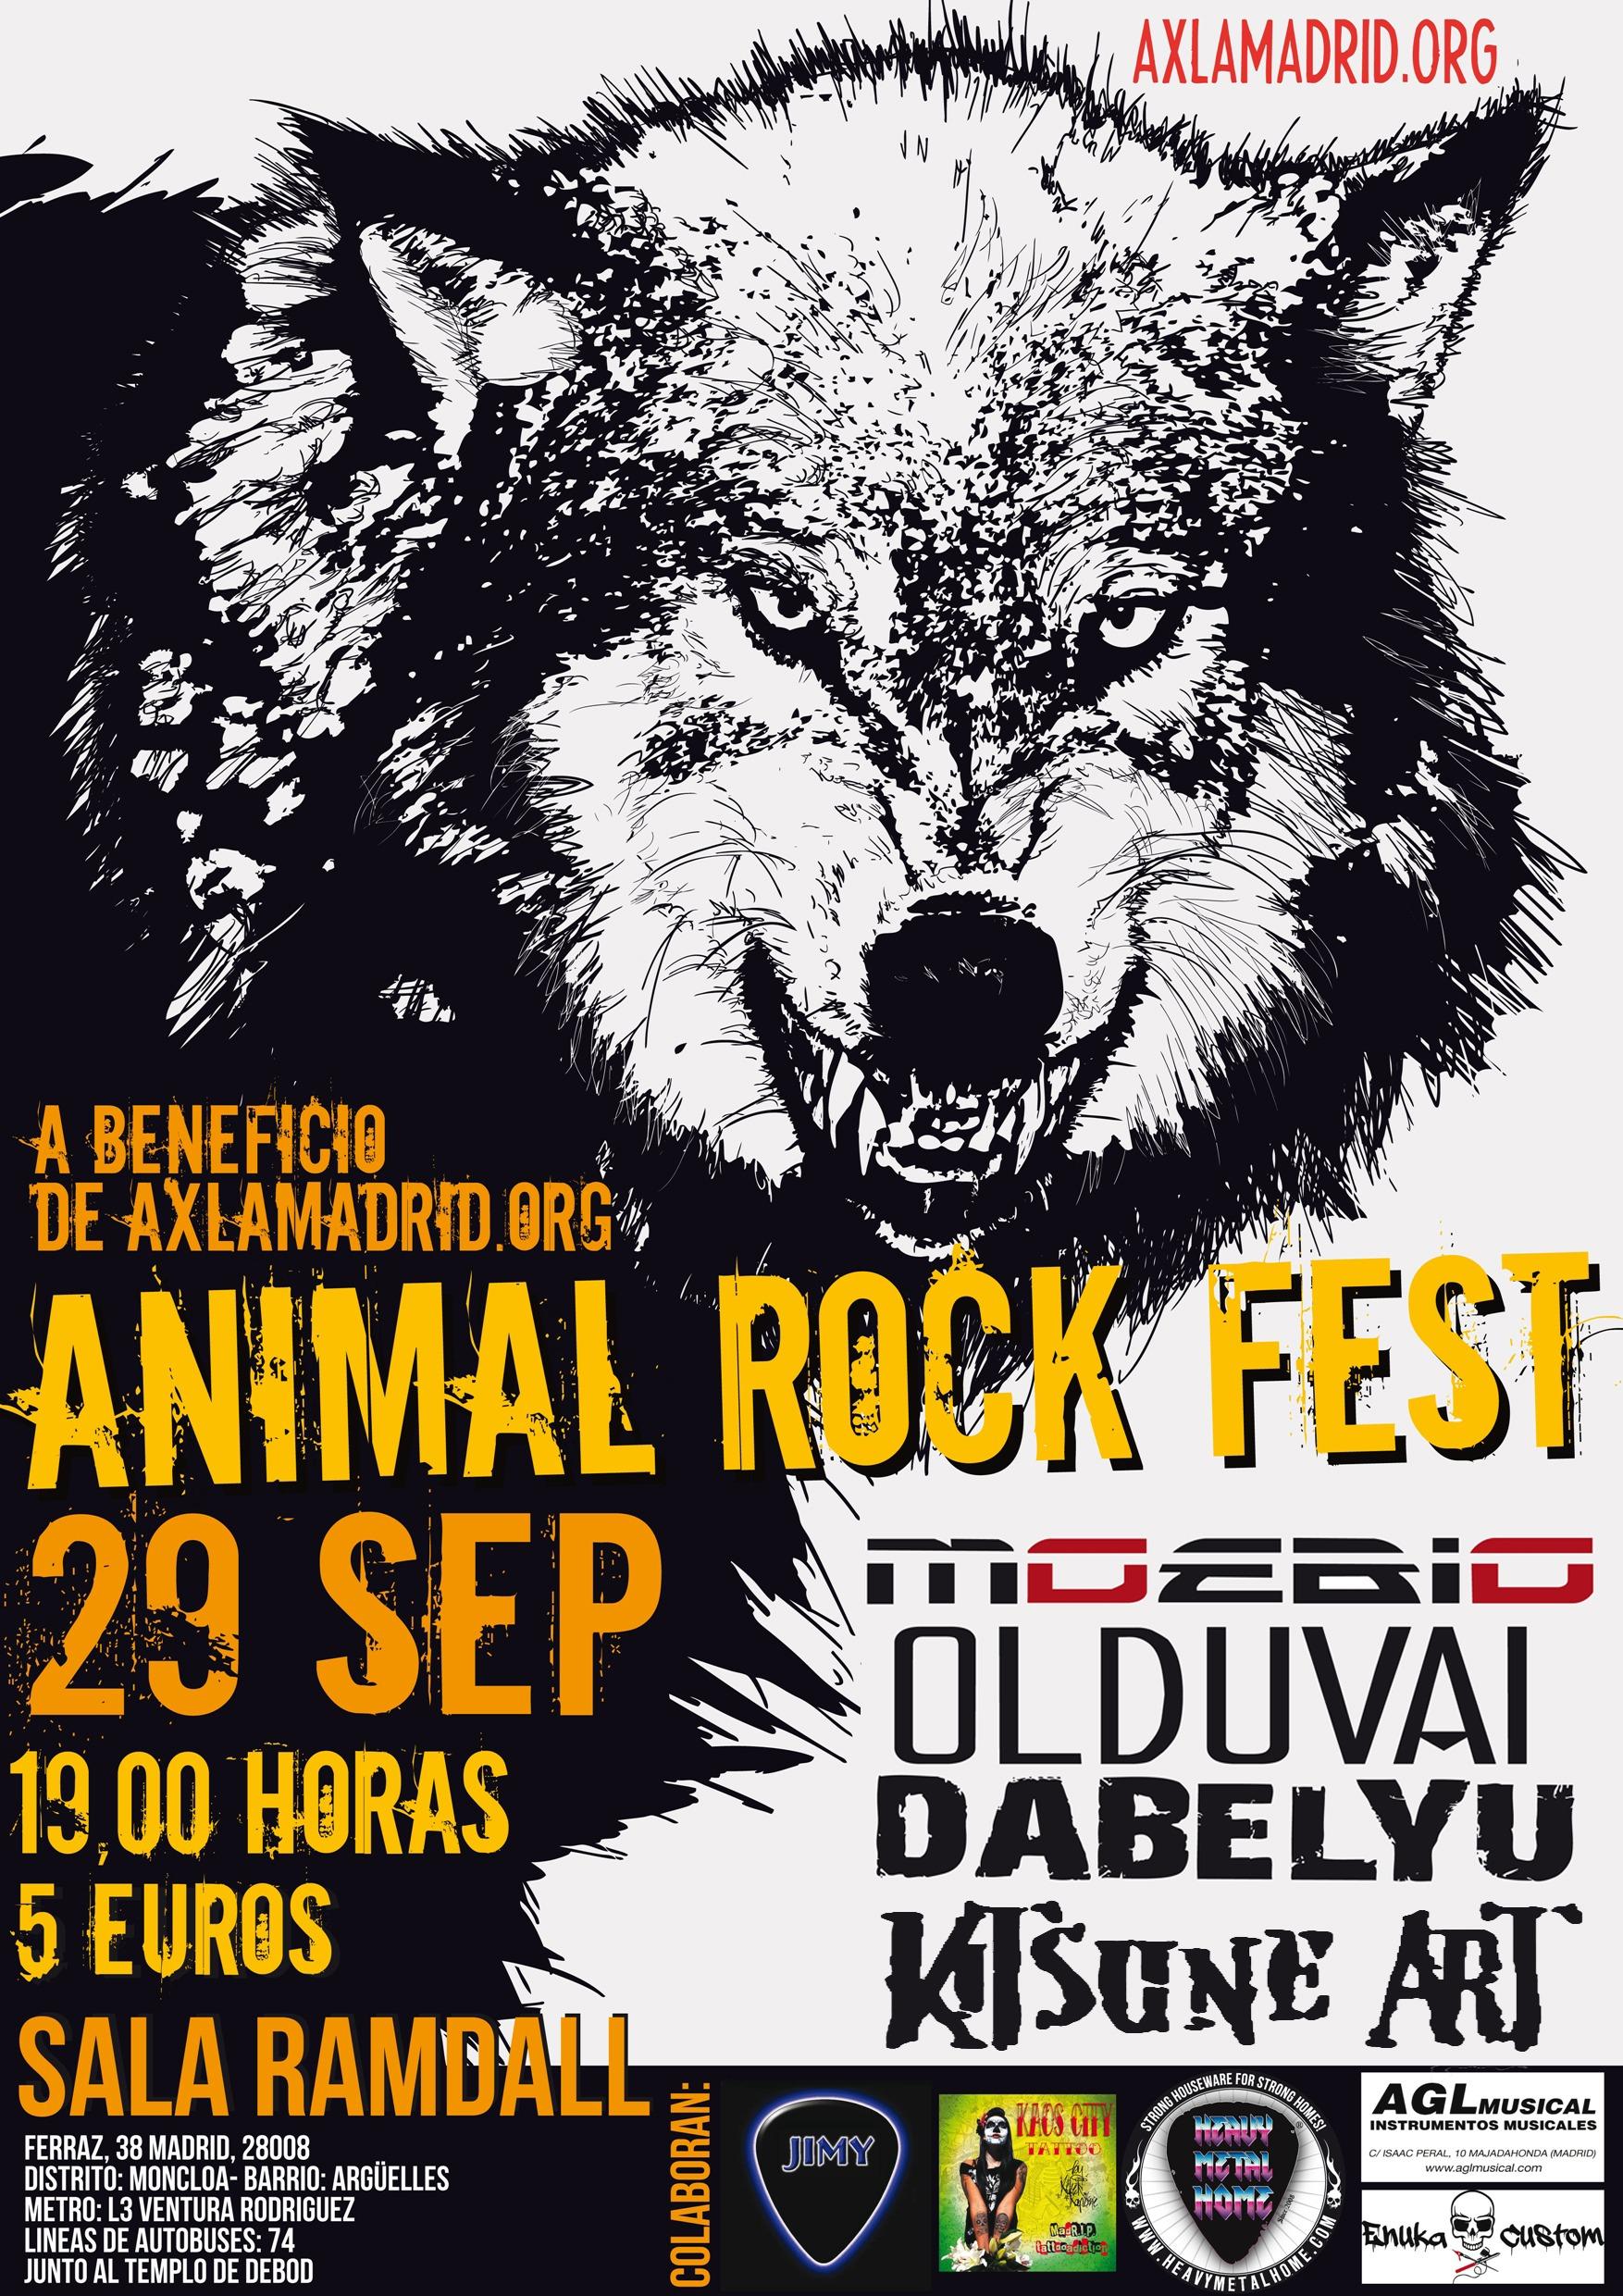 ANIMAL ROCK FEST, 29 de septiembre en Madrid.